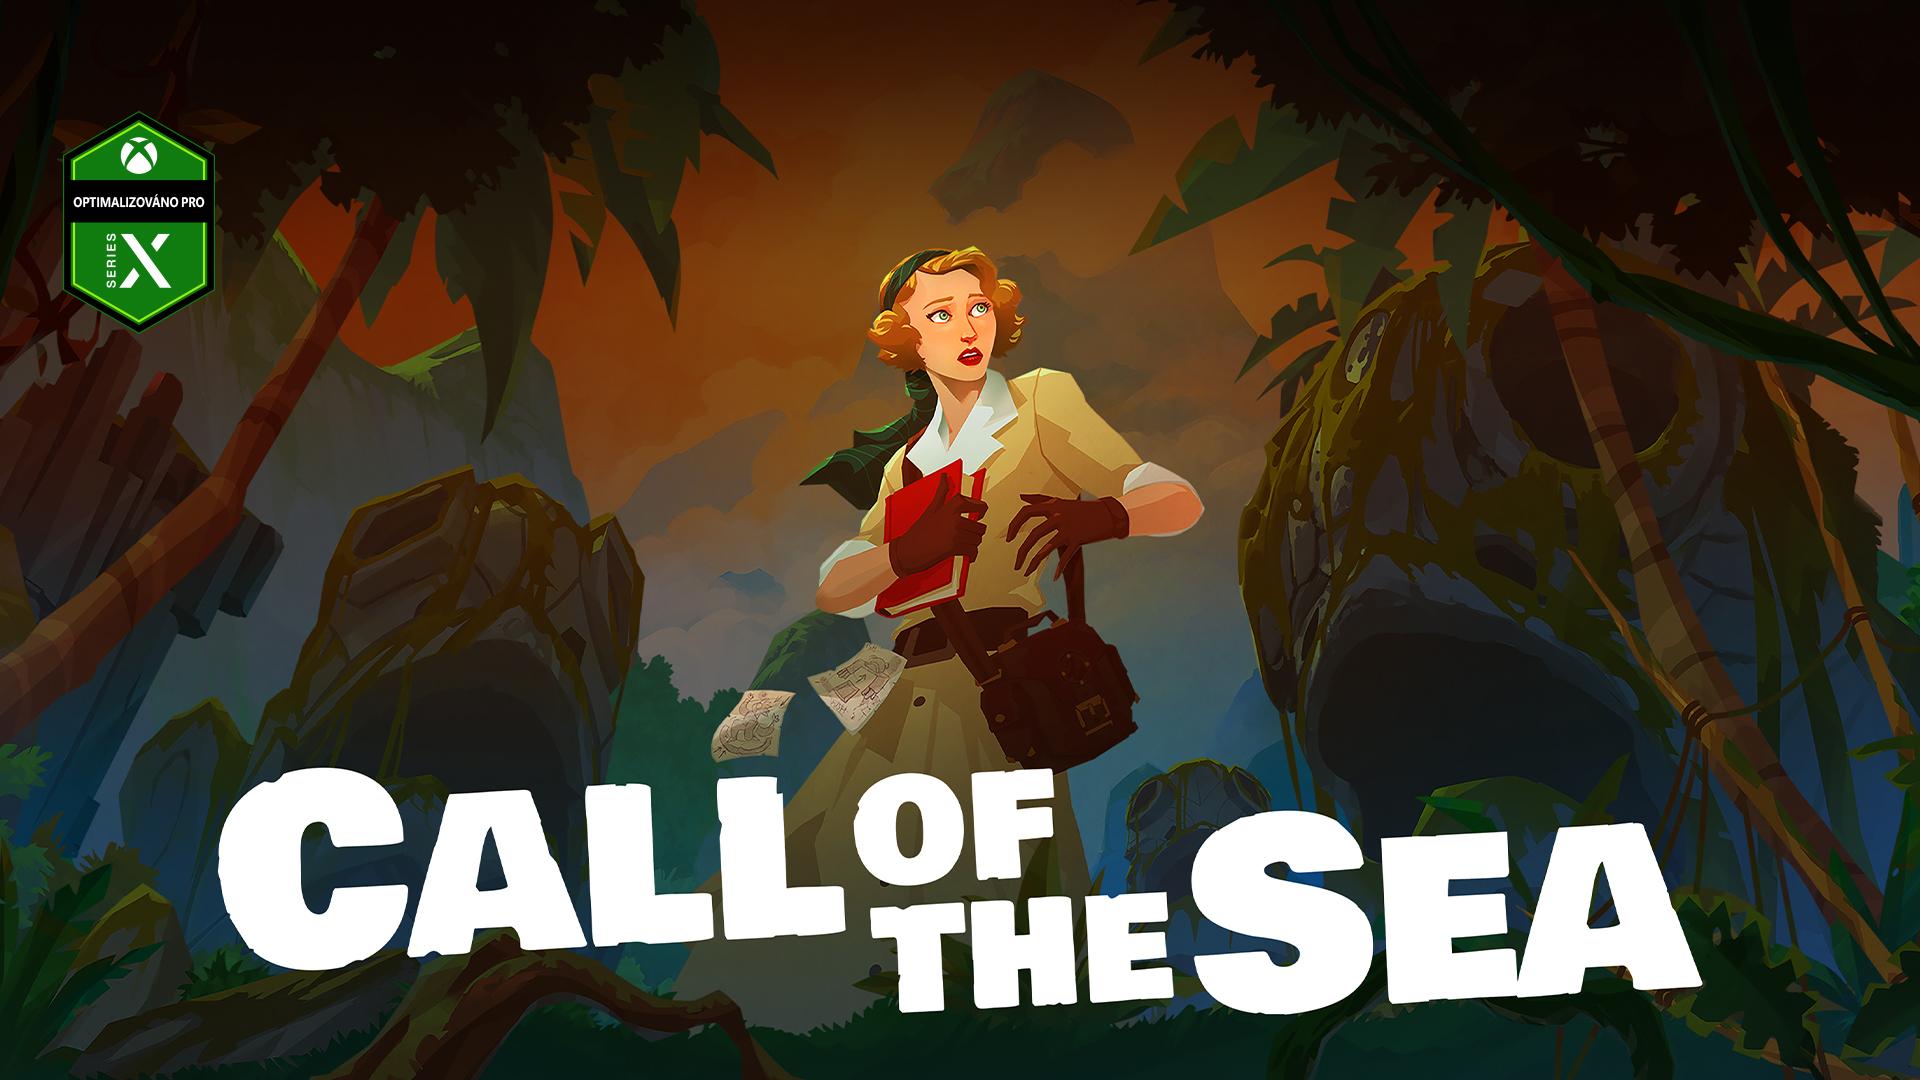 Logo Optimalizováno pro series X, Call of the Sea, Norah v džungli